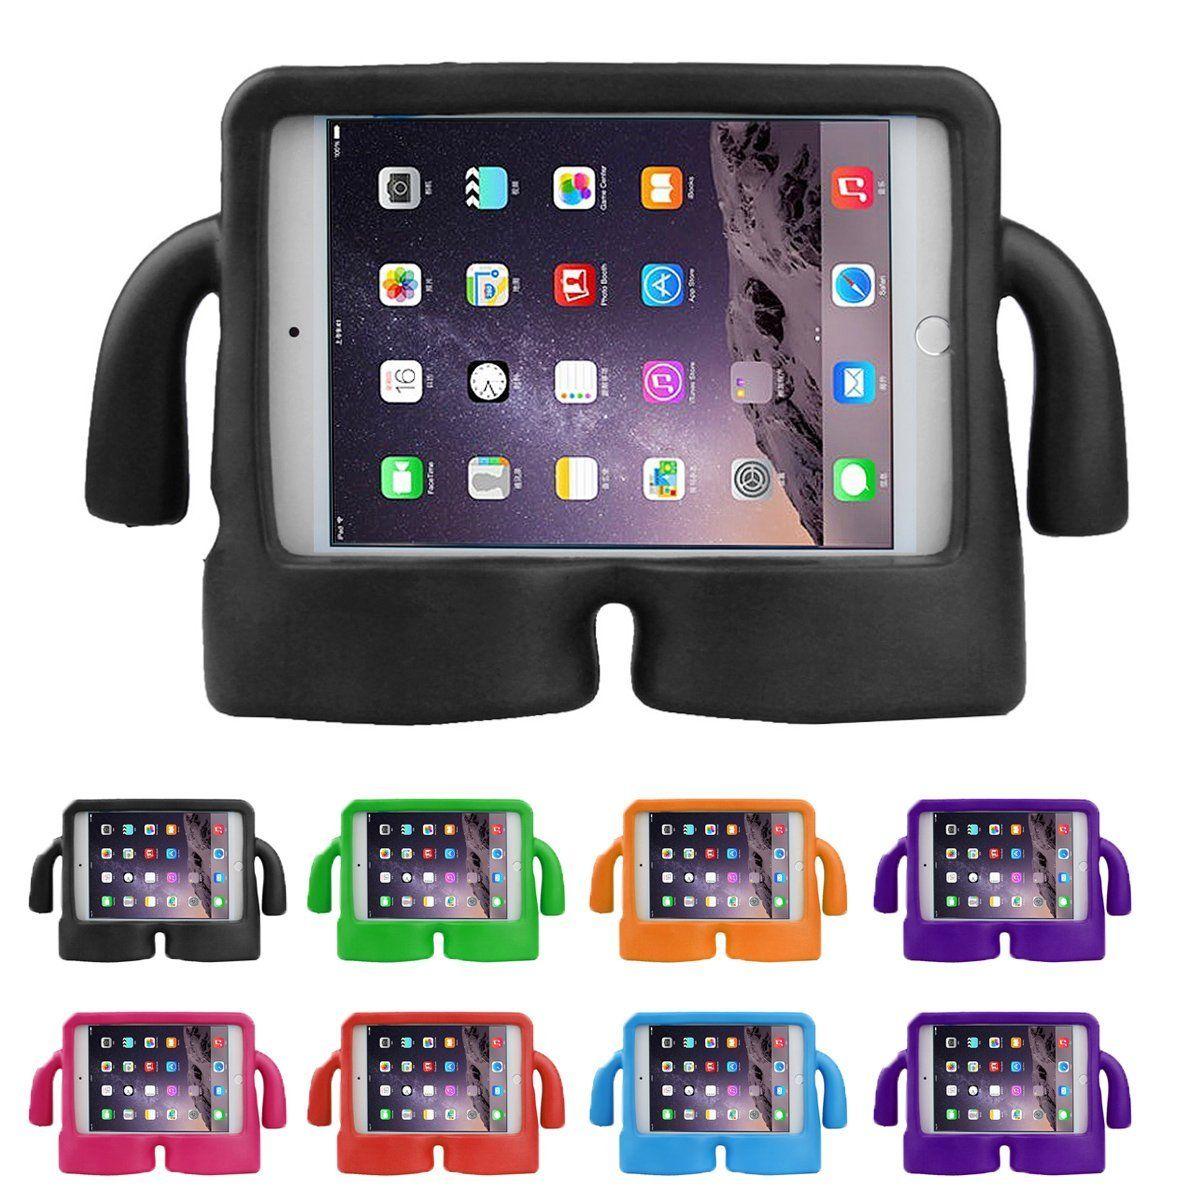 Capa Case Iguy Tablet Apple Ipad Mini 1 2 3 4 Shock Preto